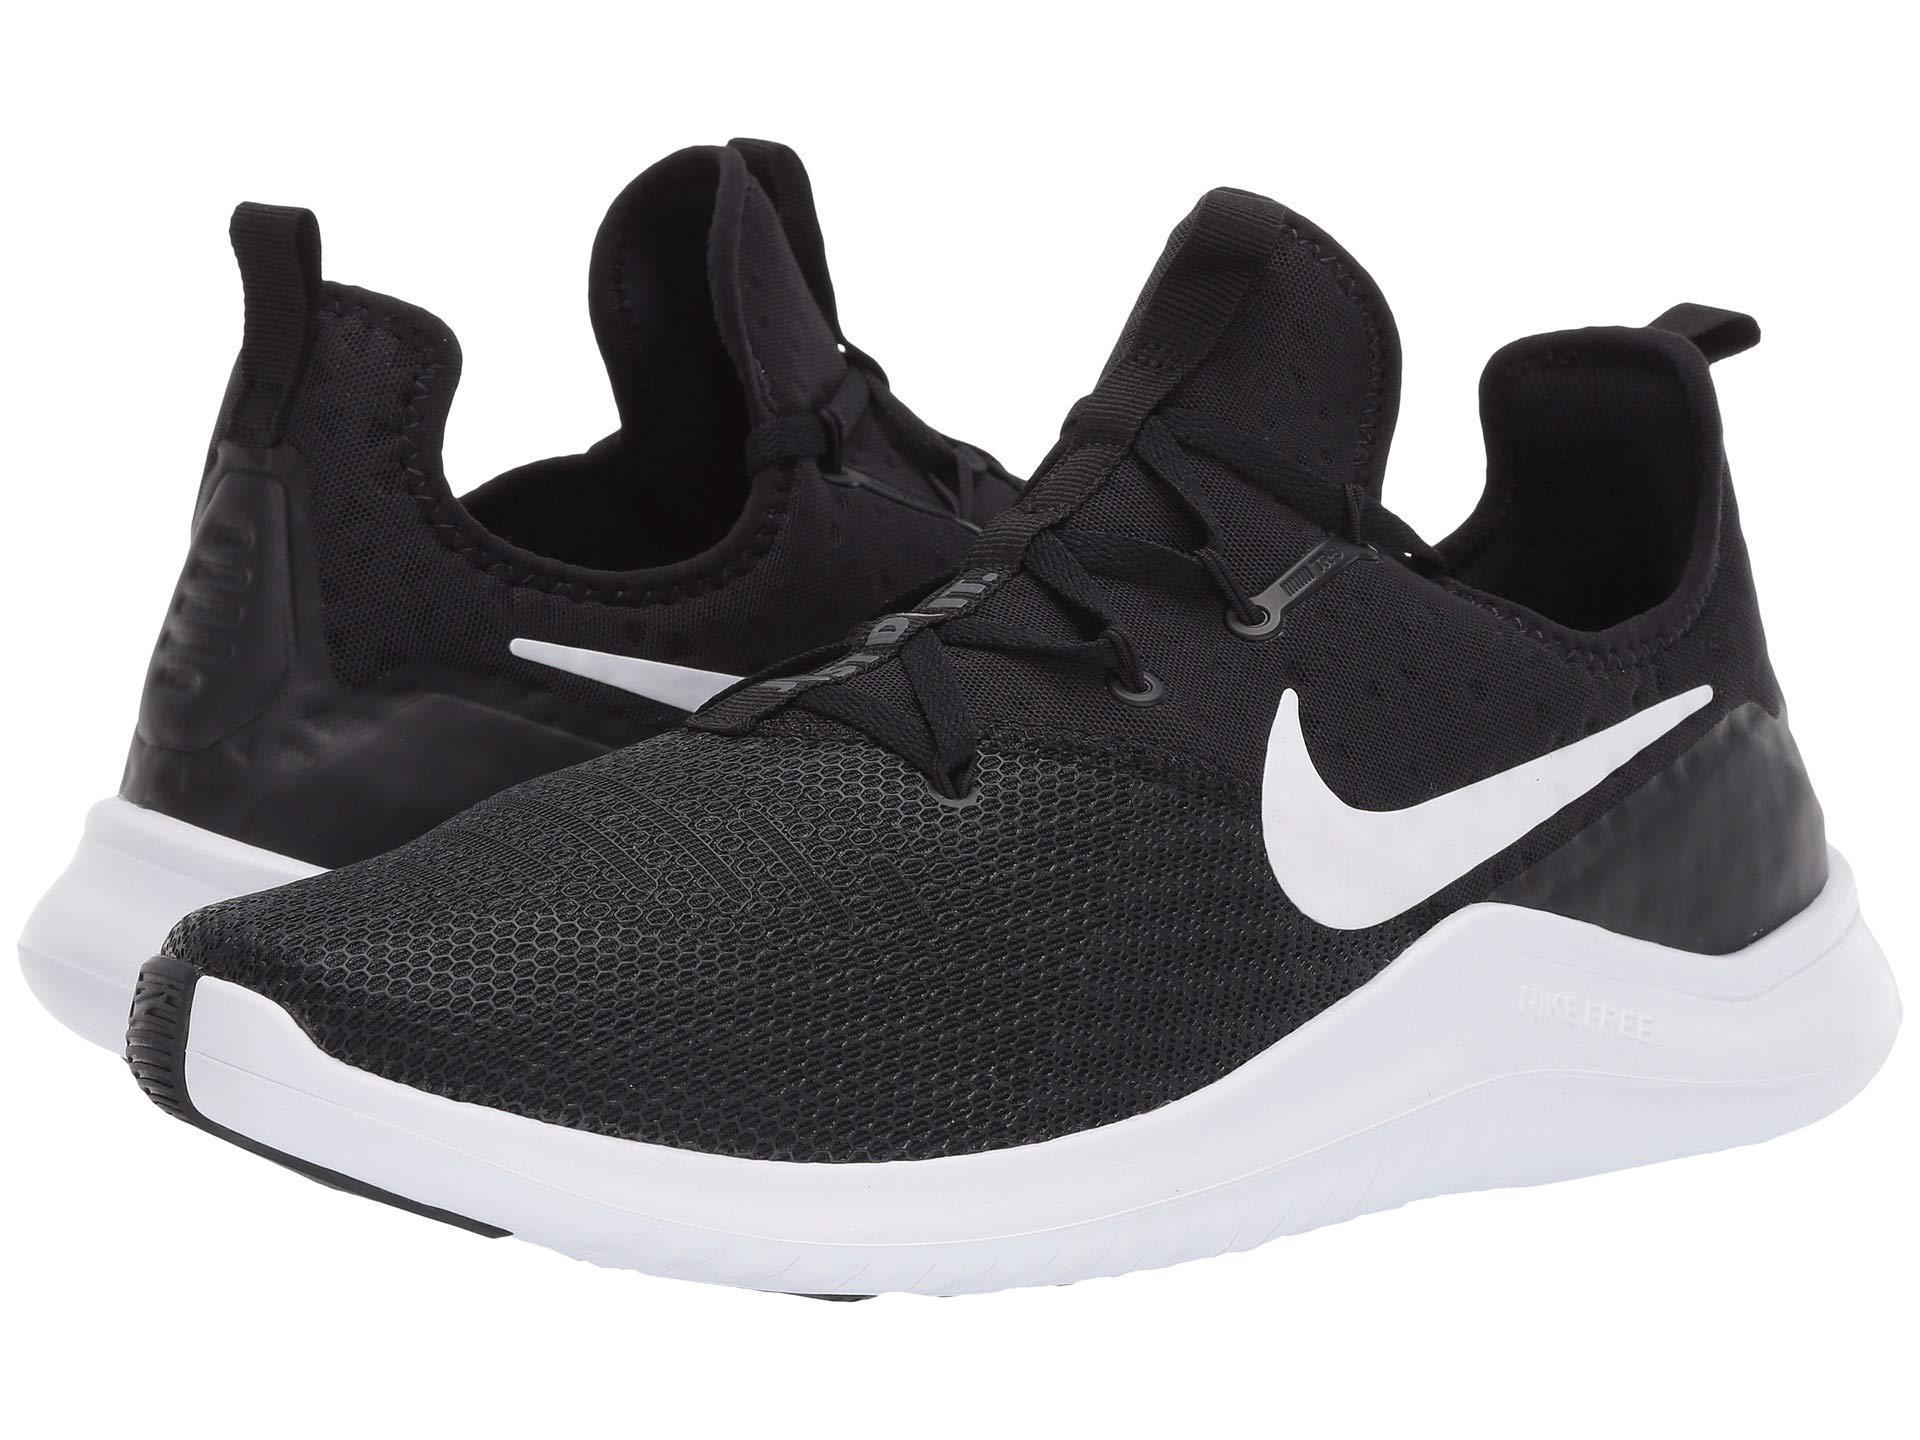 detailed look c8d53 8681e Nike. Free Tr-8 (black black) Men s Cross Training Shoes